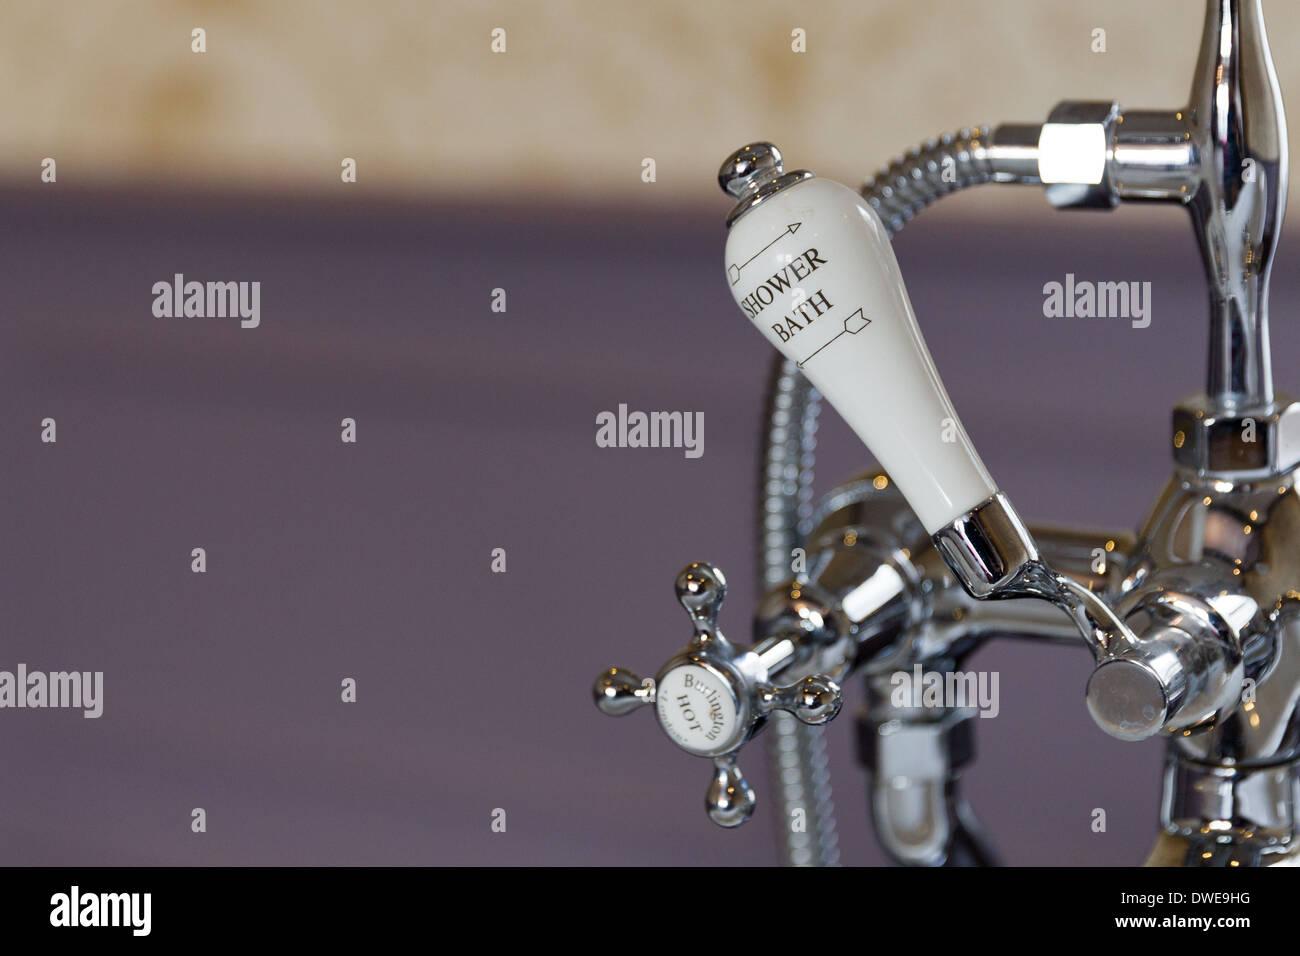 Shower bath controls taps - Stock Image